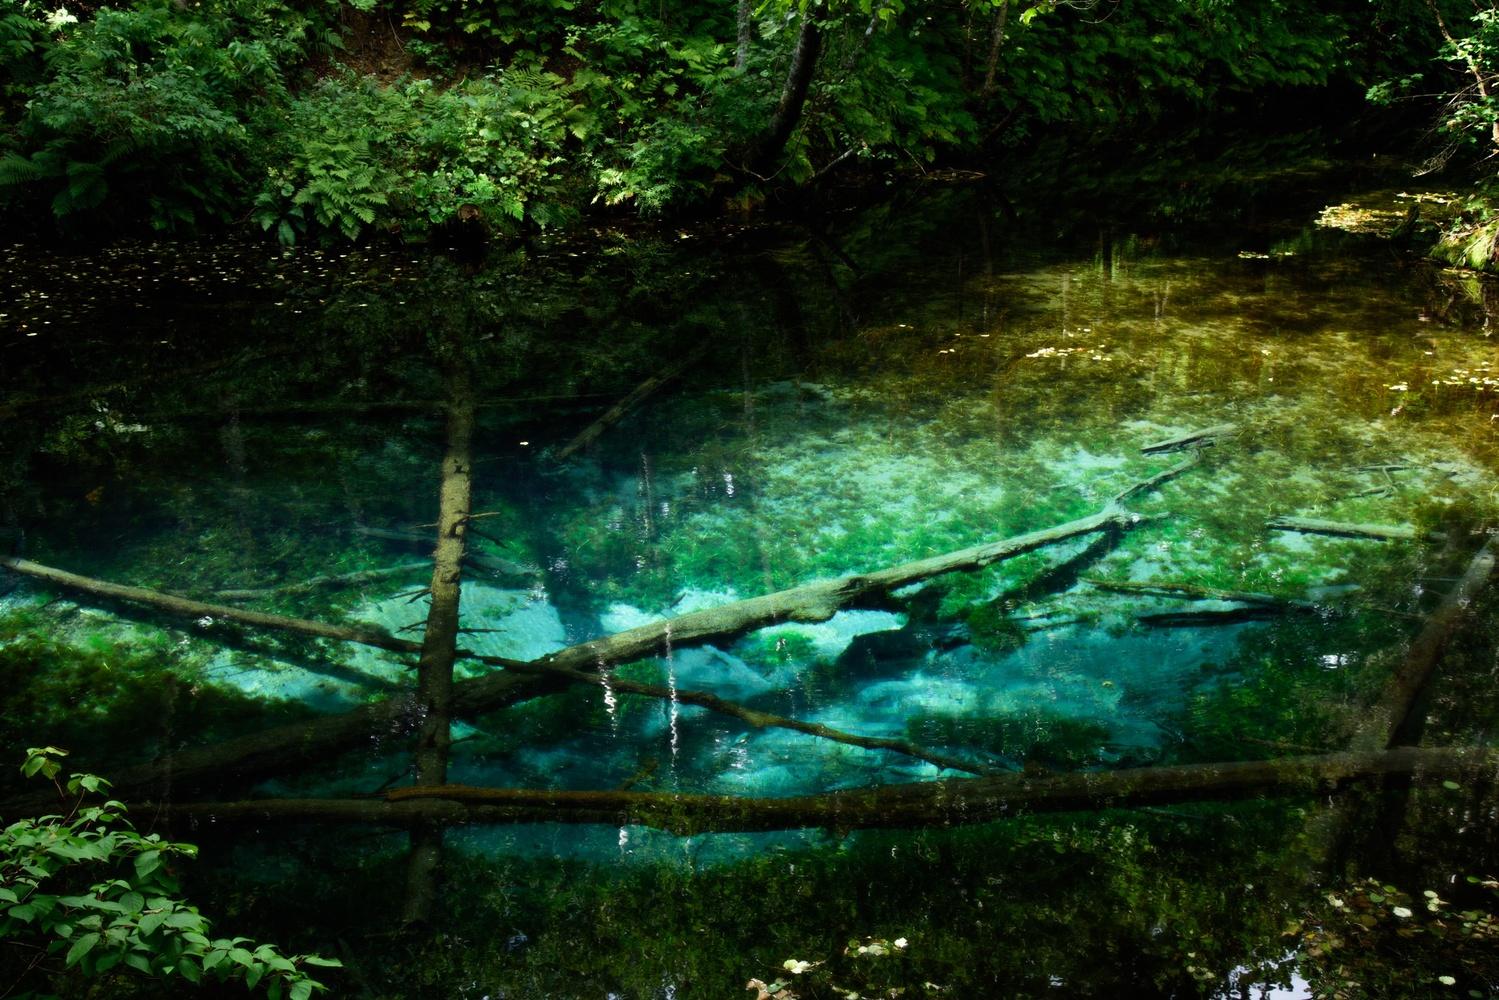 Kaminoko pond by Masataka Inada